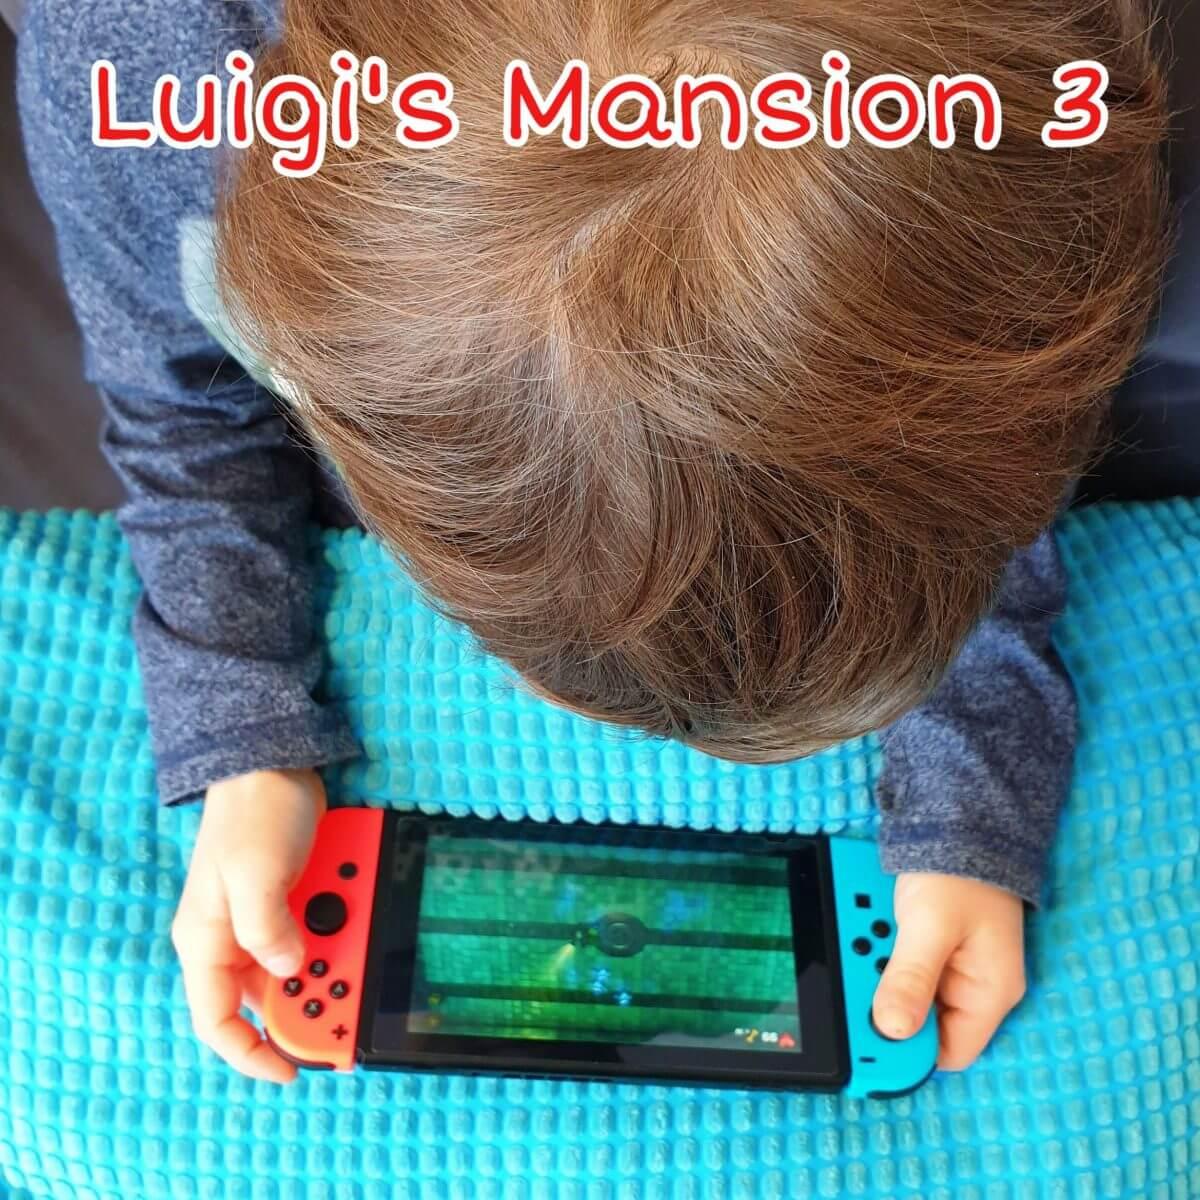 Luigi's Mansion 3 op de Nintendo Switch: game review